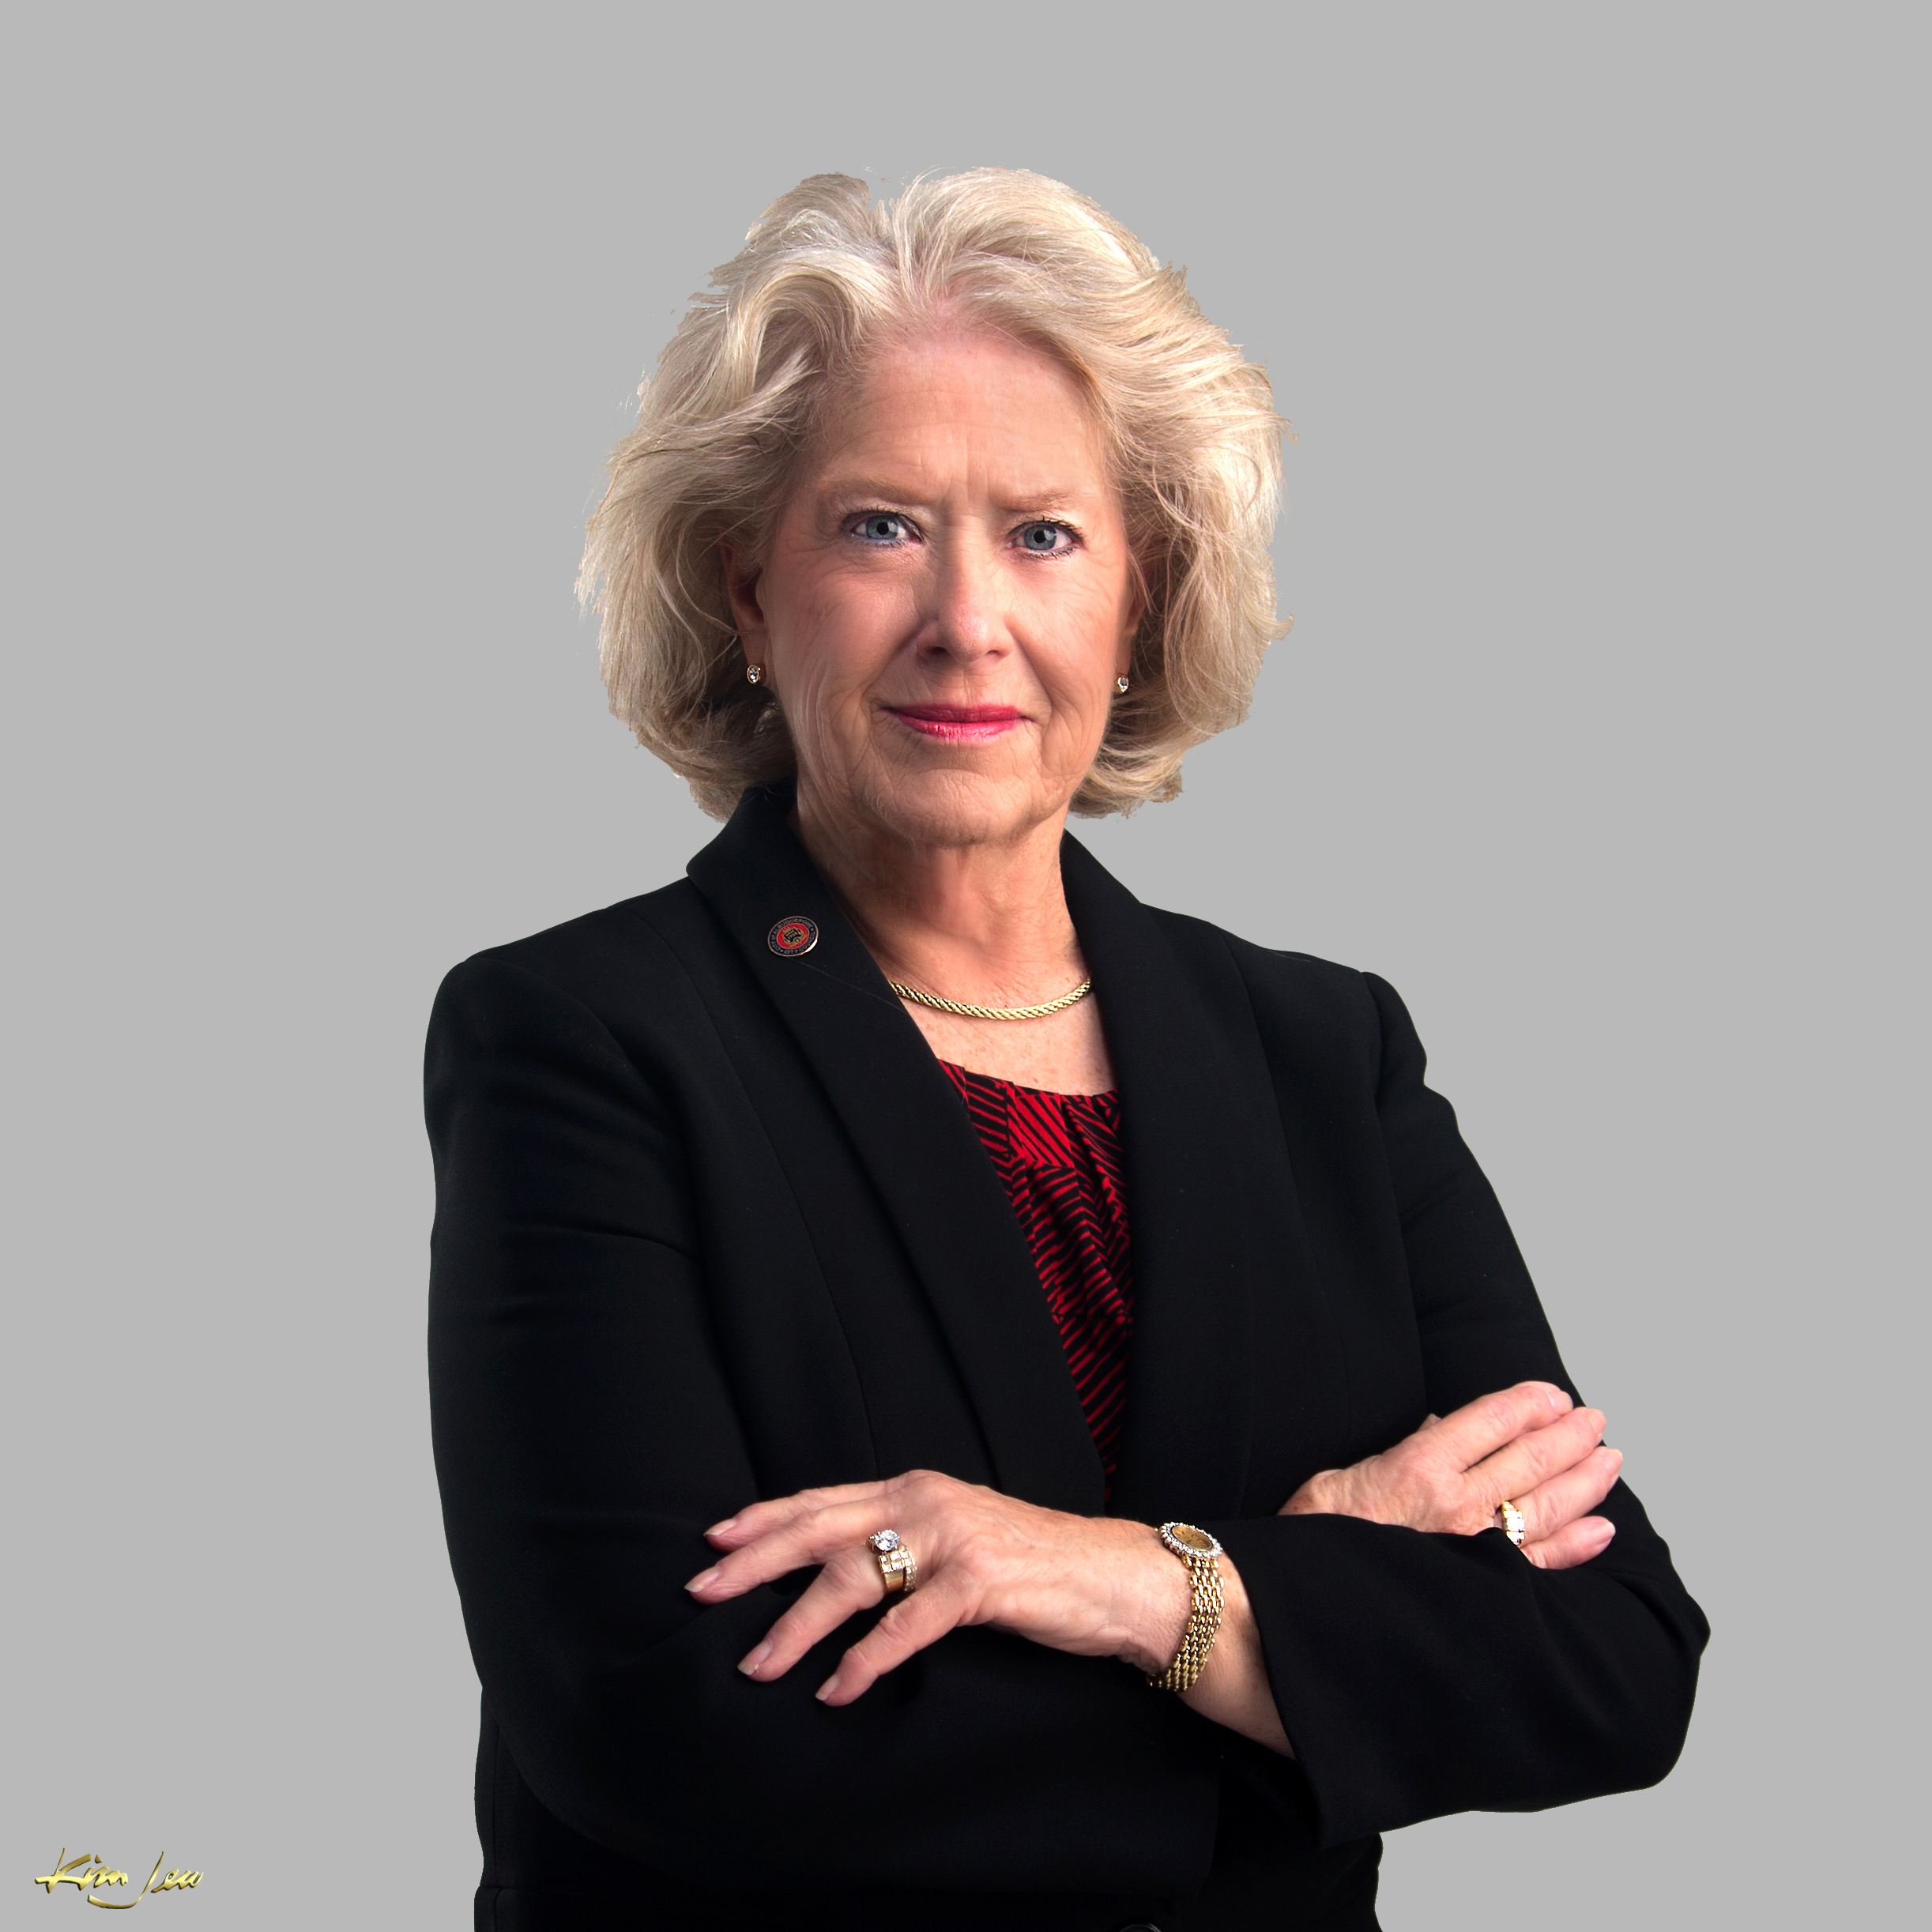 City Councilor Trudy Jones.